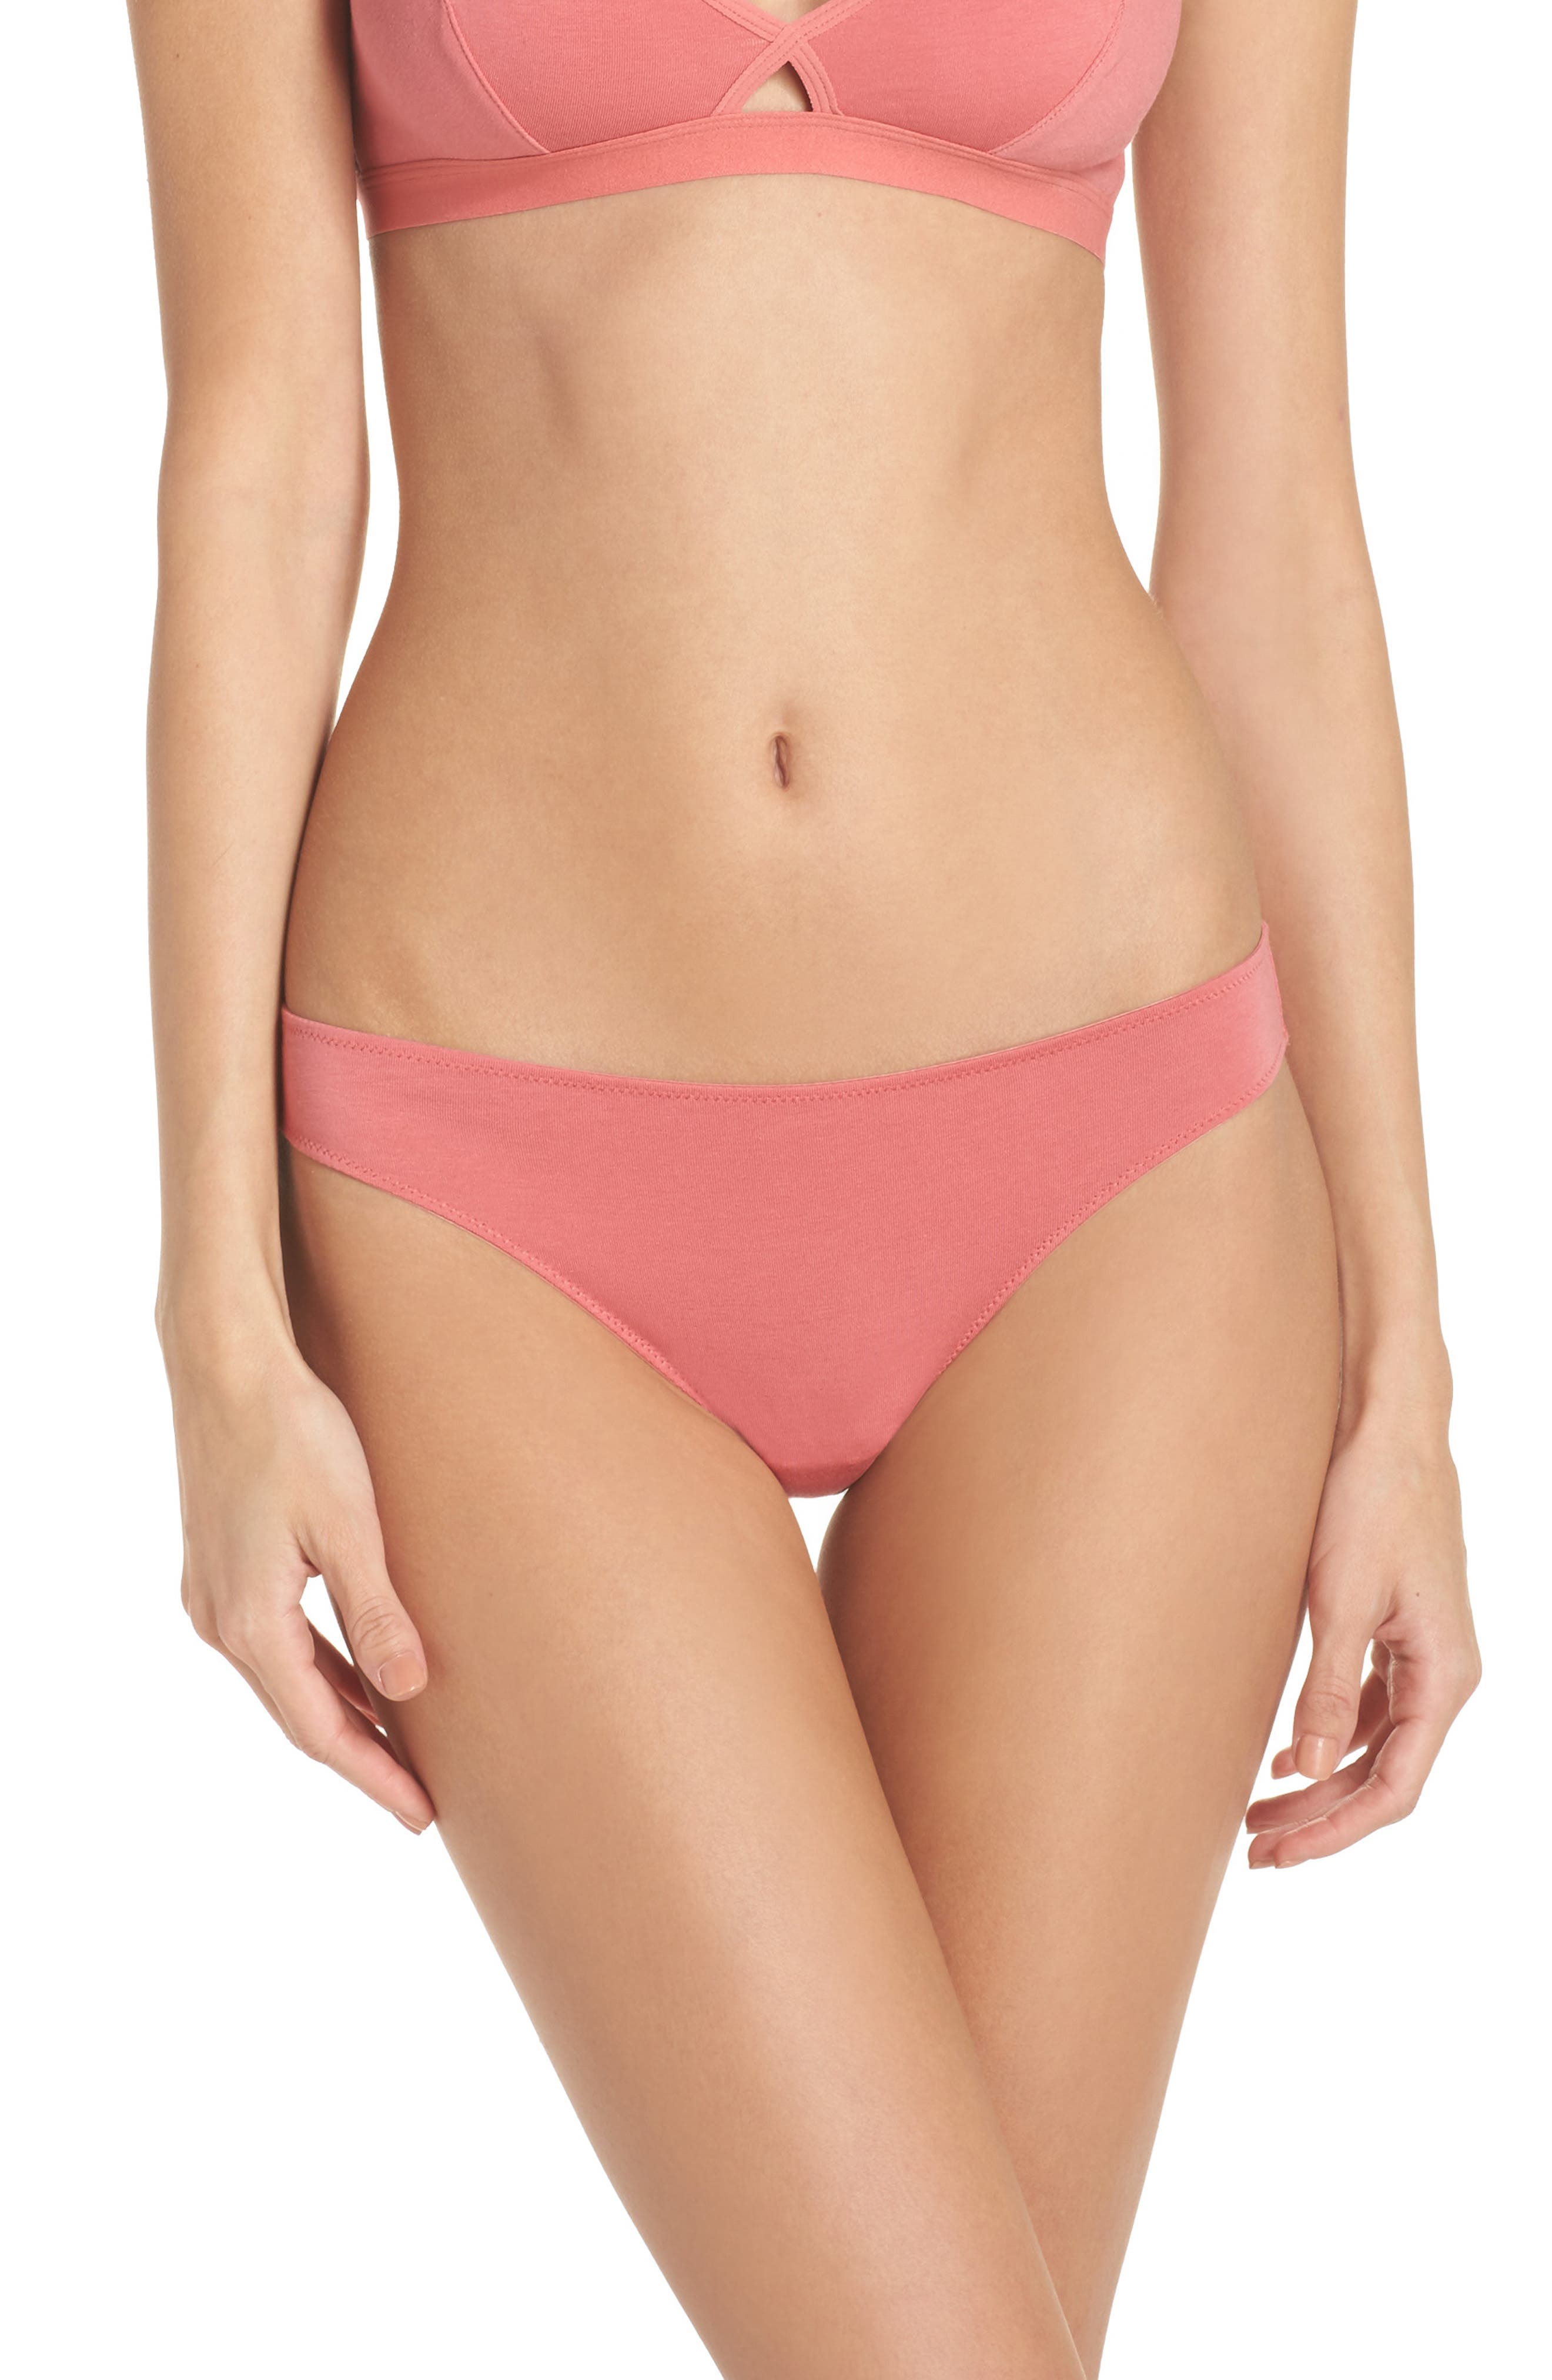 Alternate Image 1 Selected - Madewell Jersey Bikini (3 for $33)